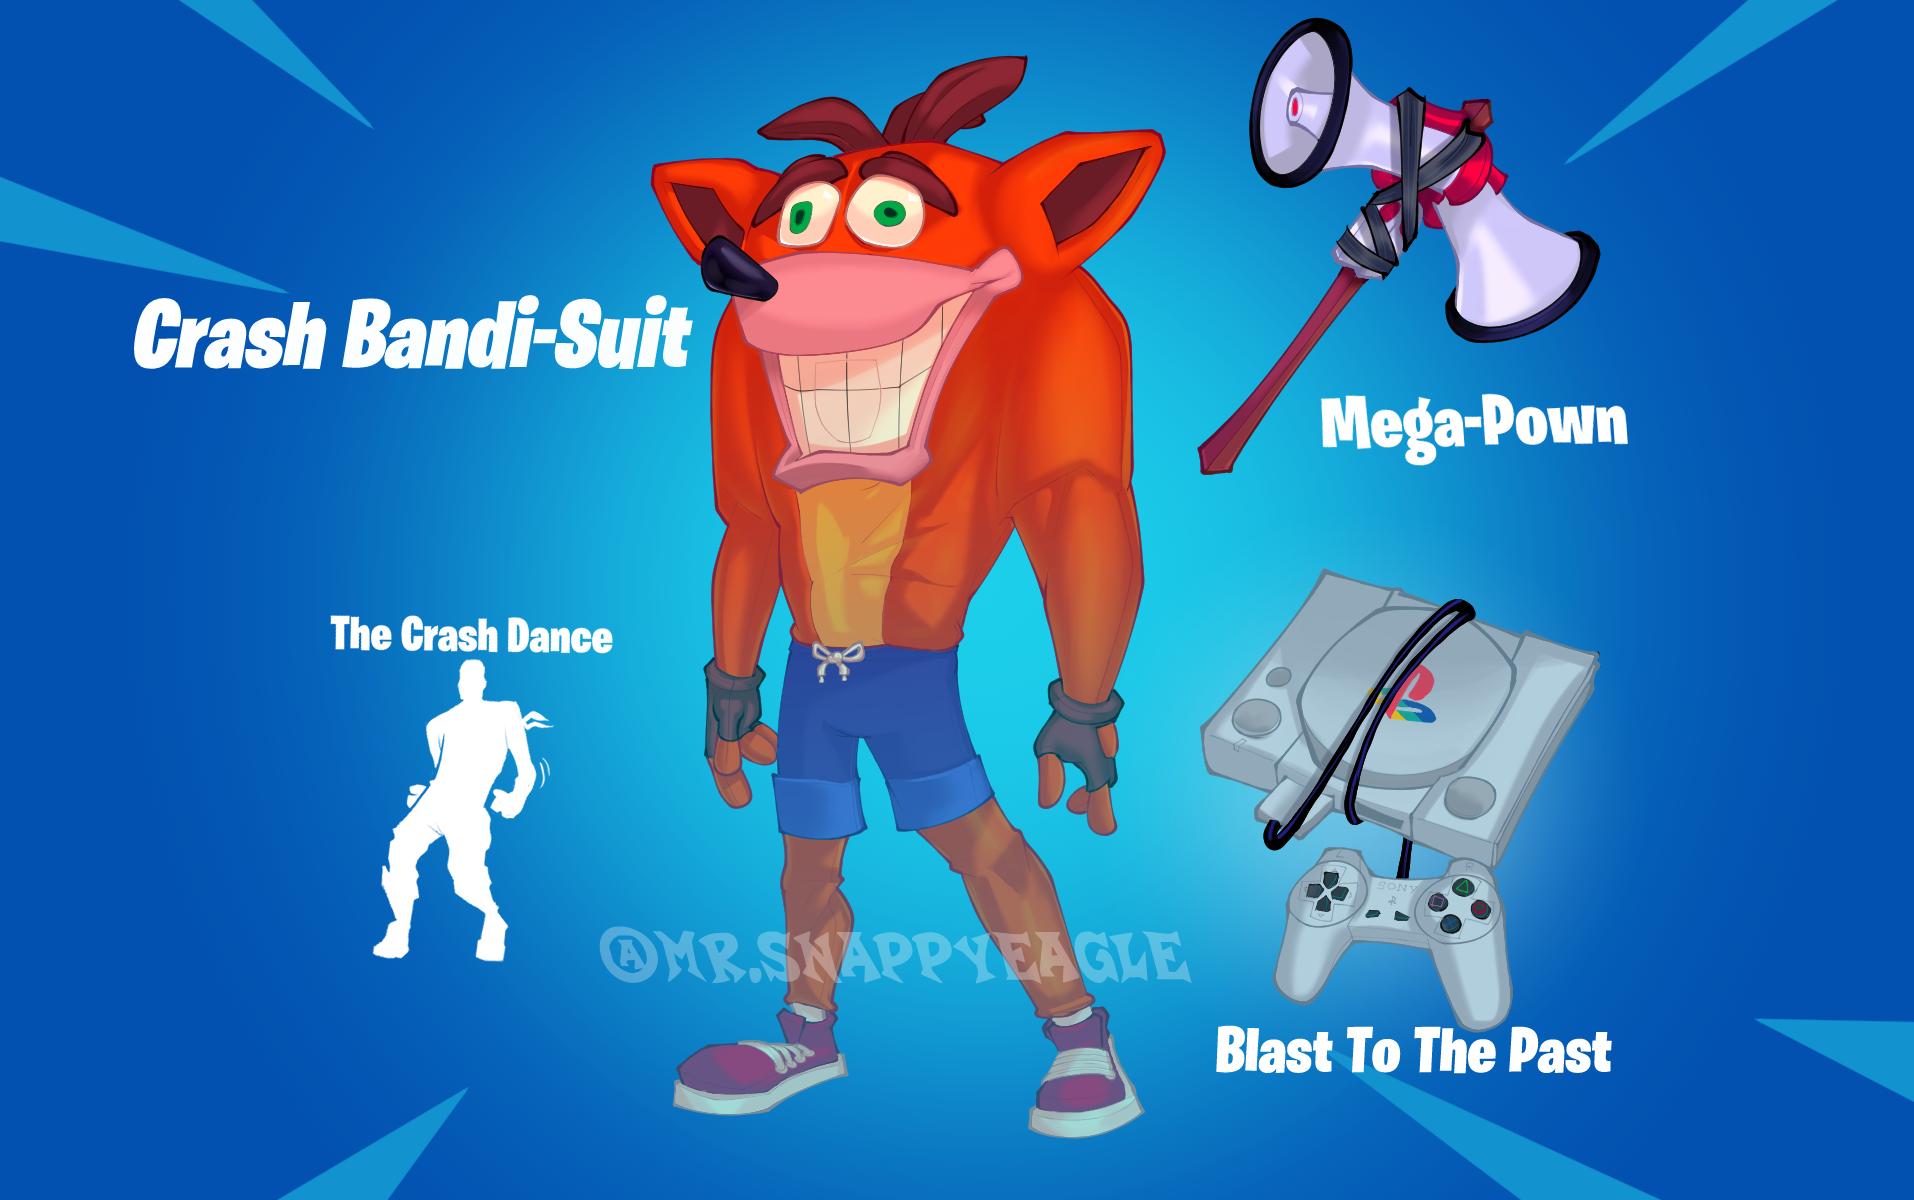 Crash Bandi-Suit Fortnite Concept